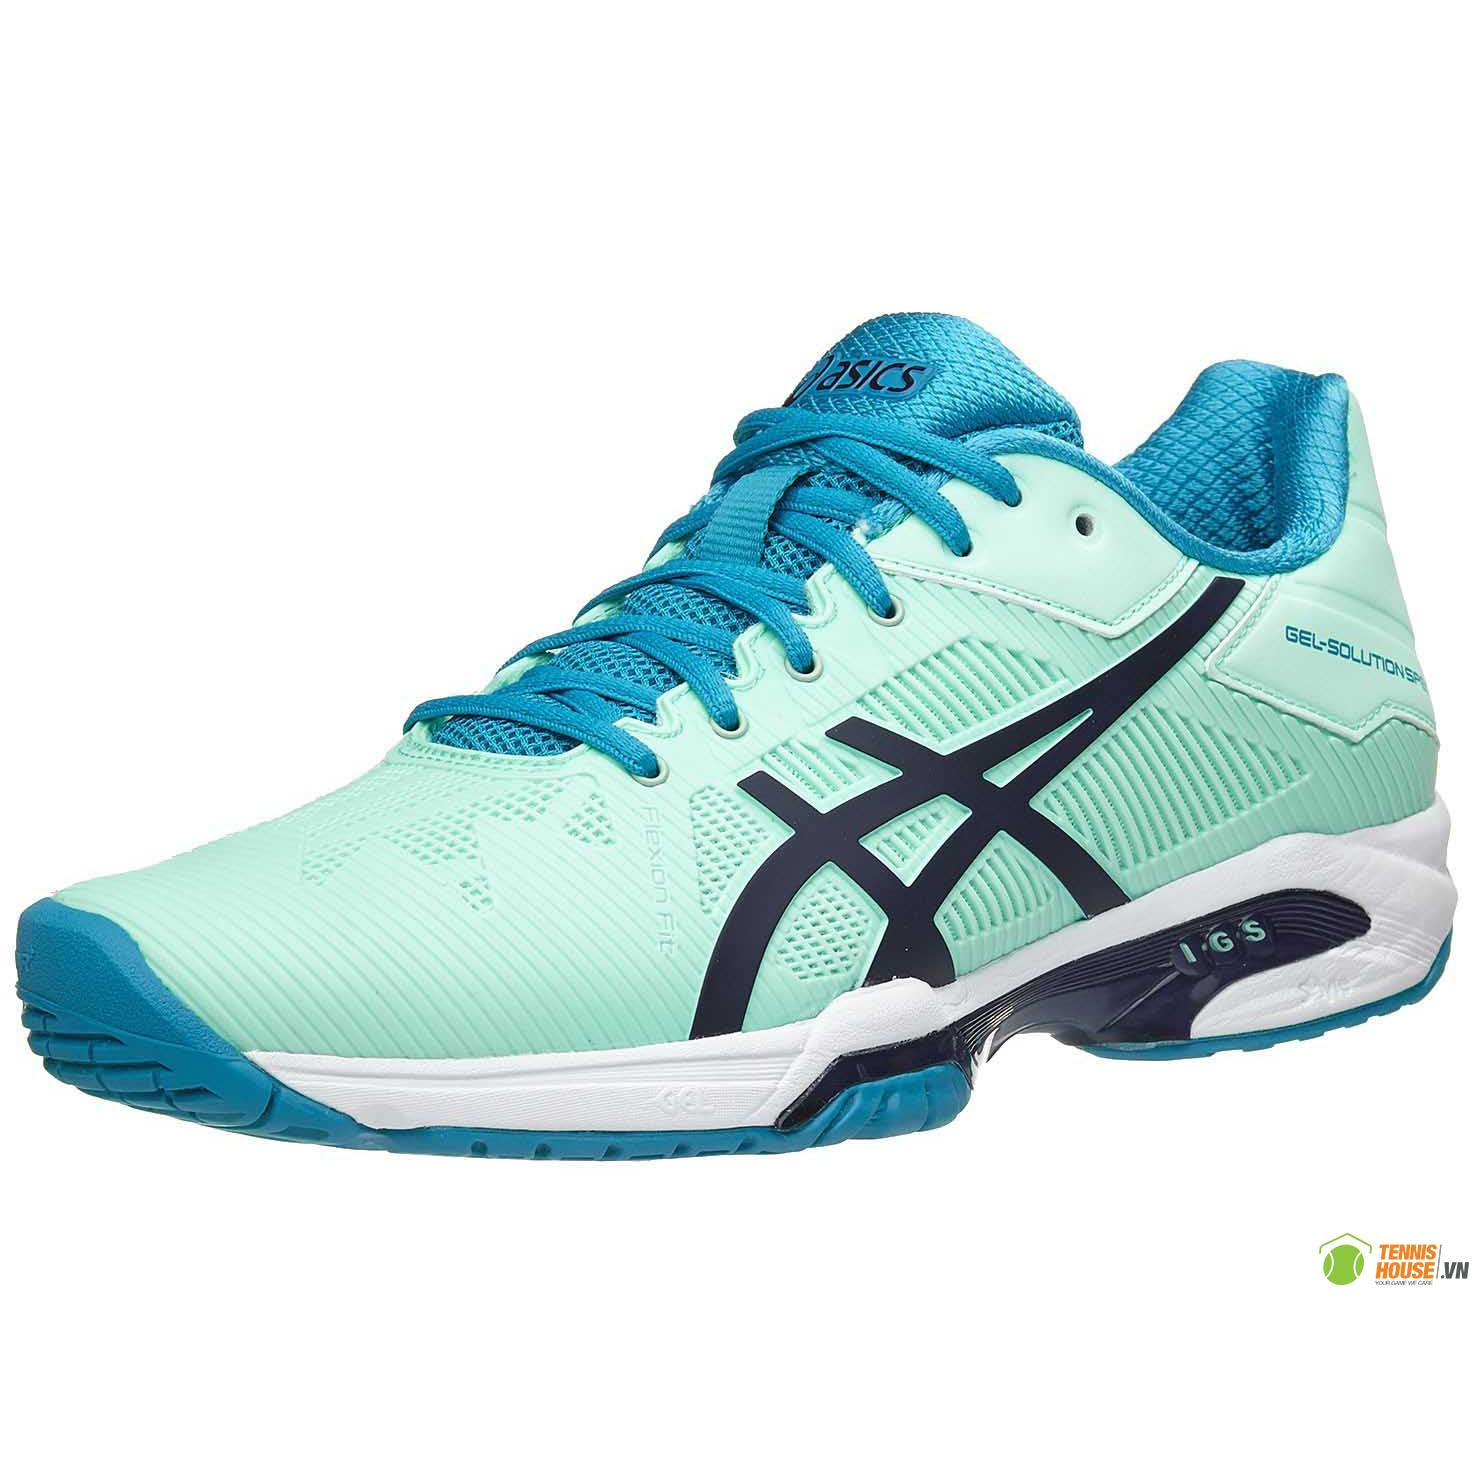 Giày Tennis Asics Nữ Gel Solution Speed 3 (E650N-6749)